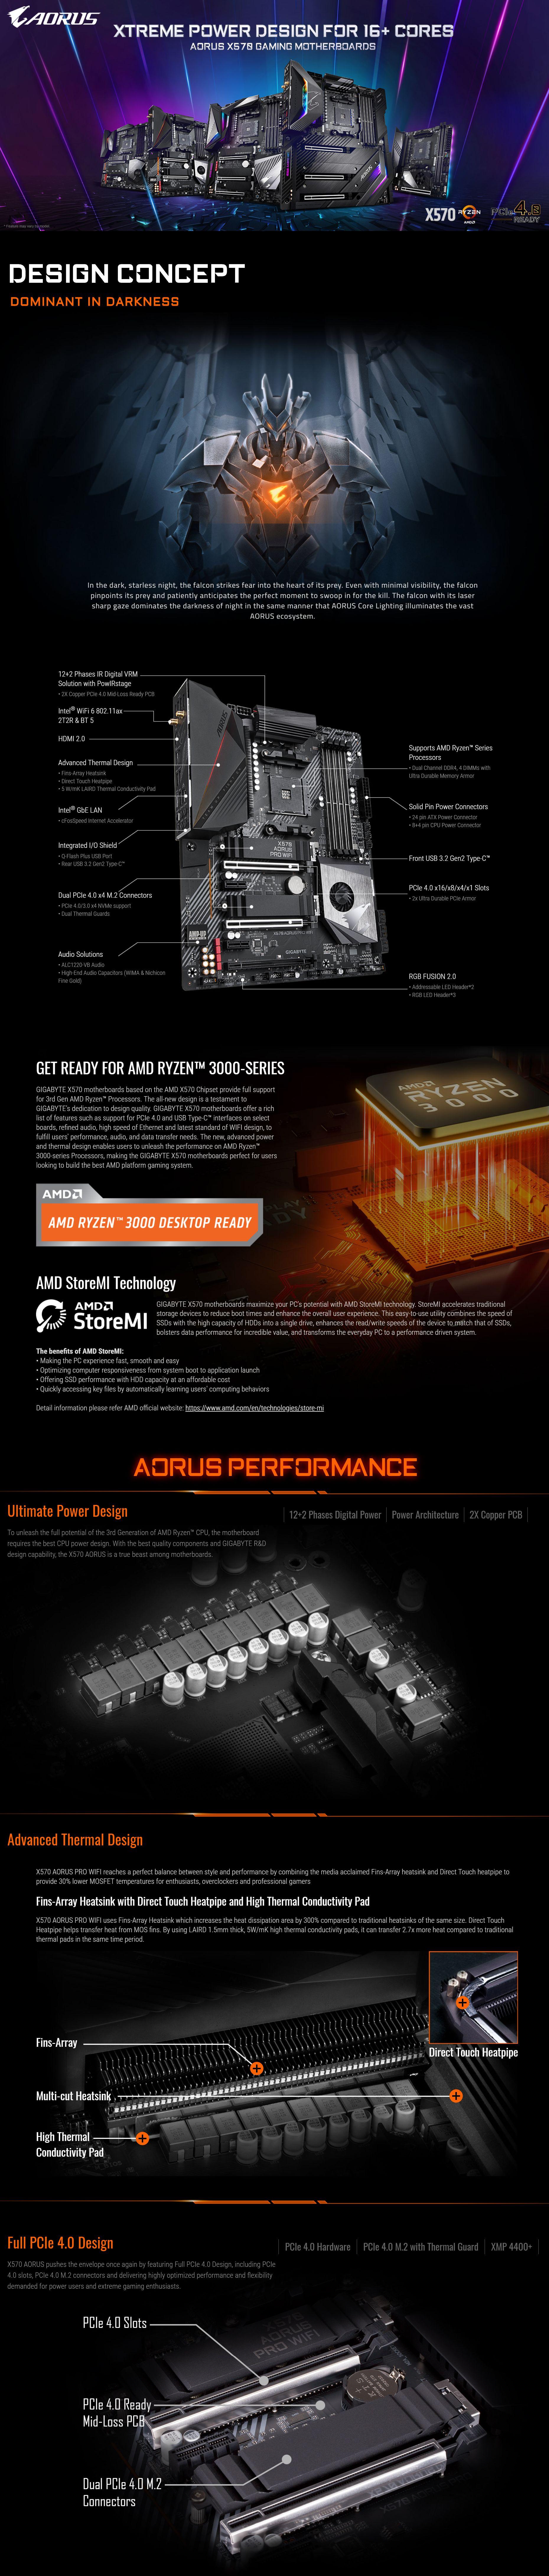 Gigabyte X570 Aorus Pro WiFi AM4 ATX Motherboard